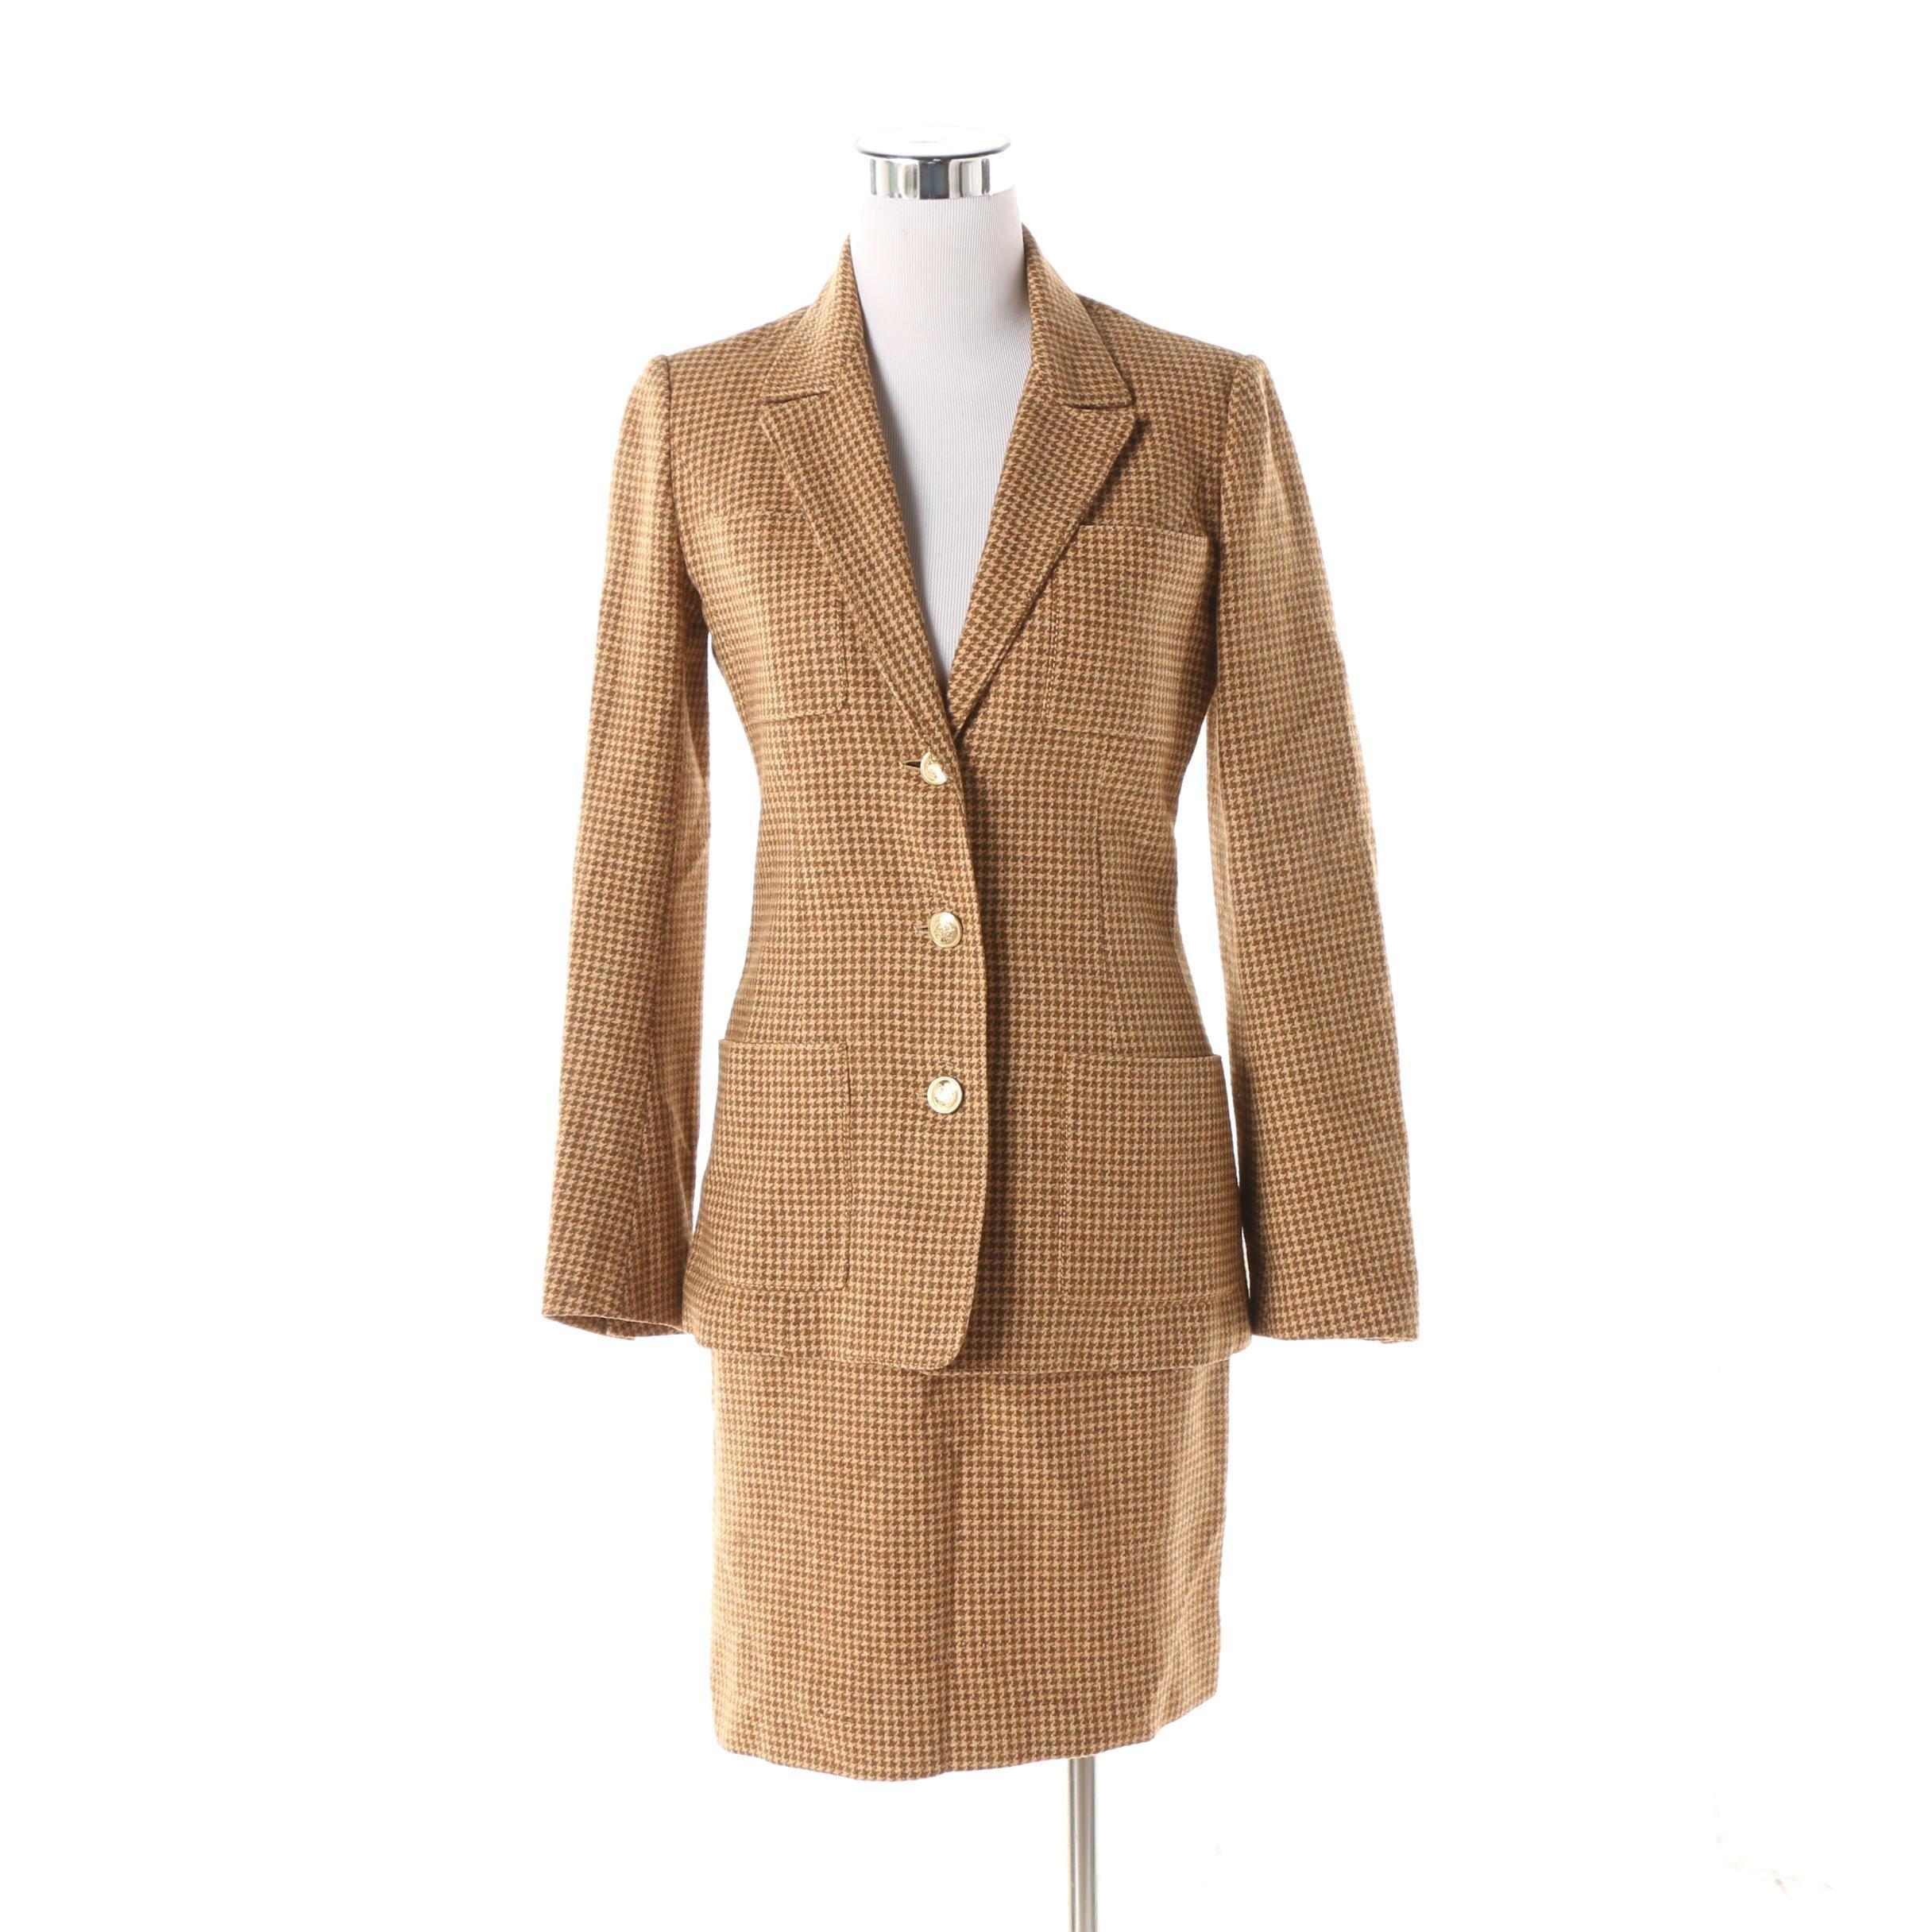 Women's Circa 1970s Vintage Hermès of Paris Houndstooth Skirt Suit